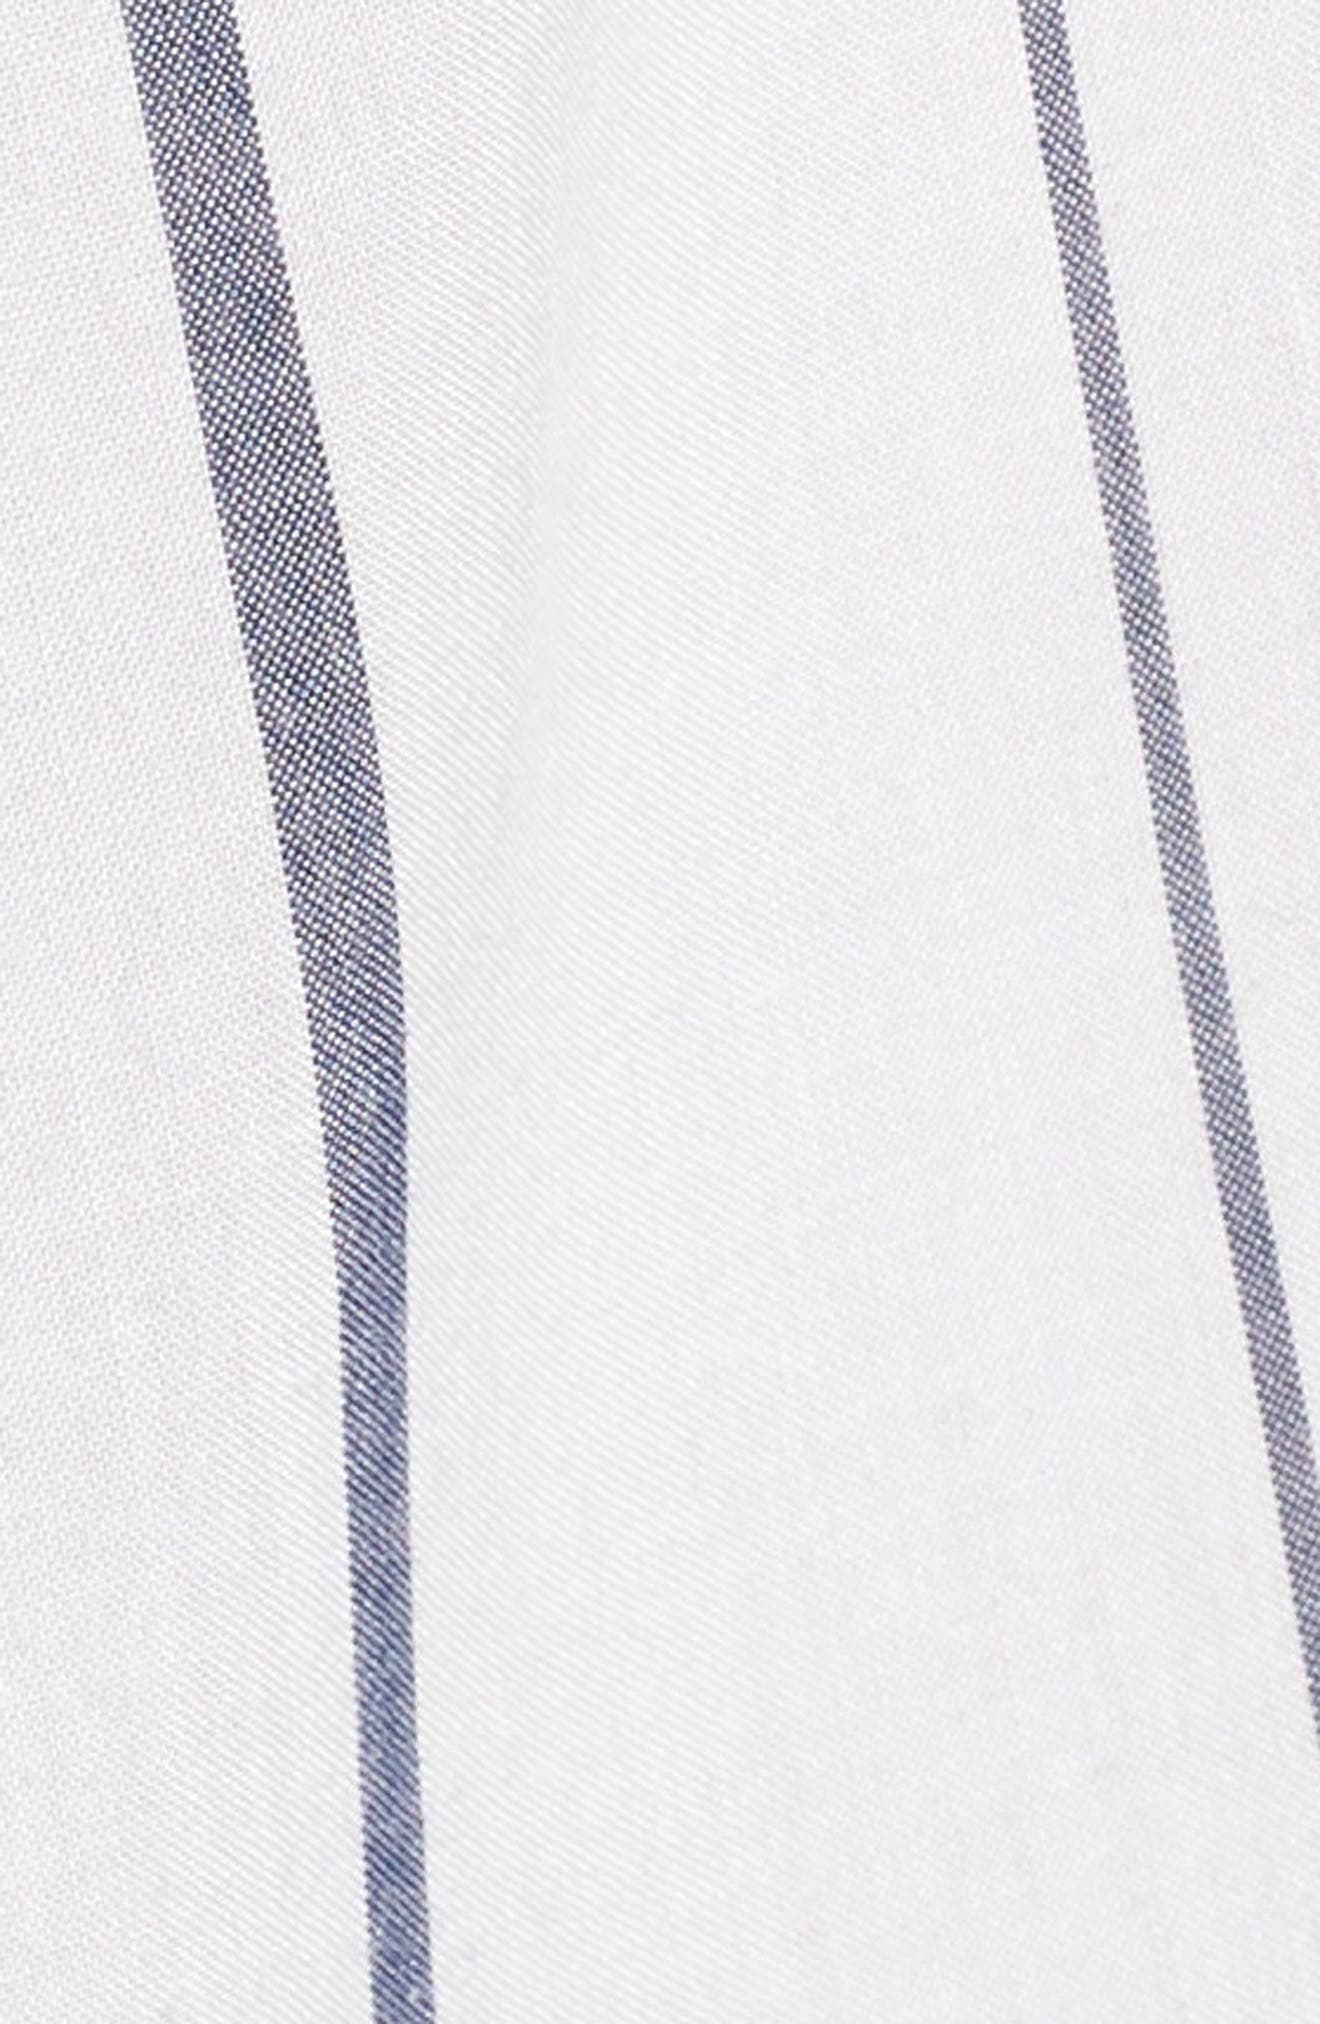 Canyons Stripe Shirt,                             Alternate thumbnail 5, color,                             100